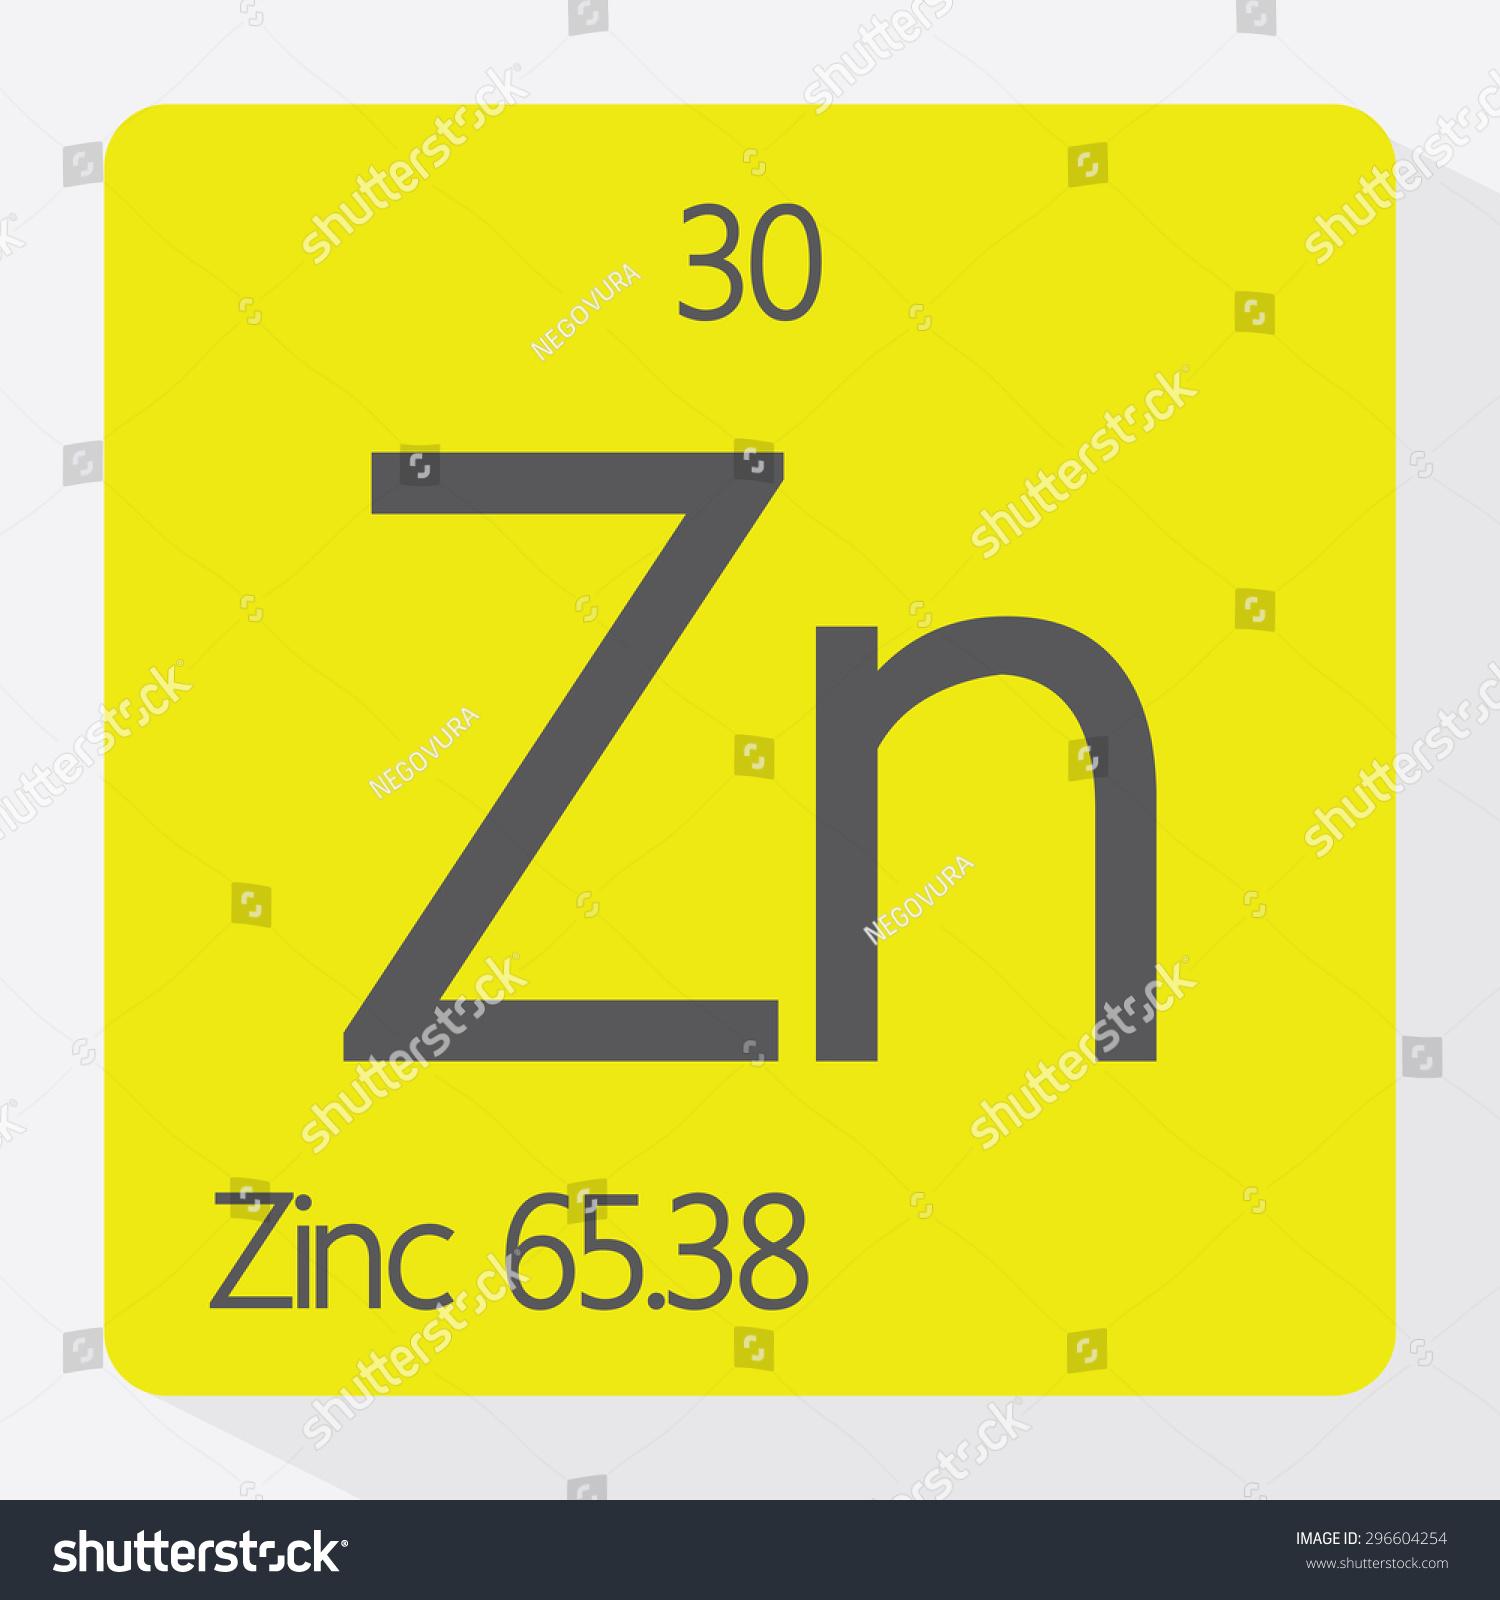 Periodic table zinc choice image periodic table images periodic table zinc choice image periodic table images periodic table for zinc choice image periodic table gamestrikefo Gallery